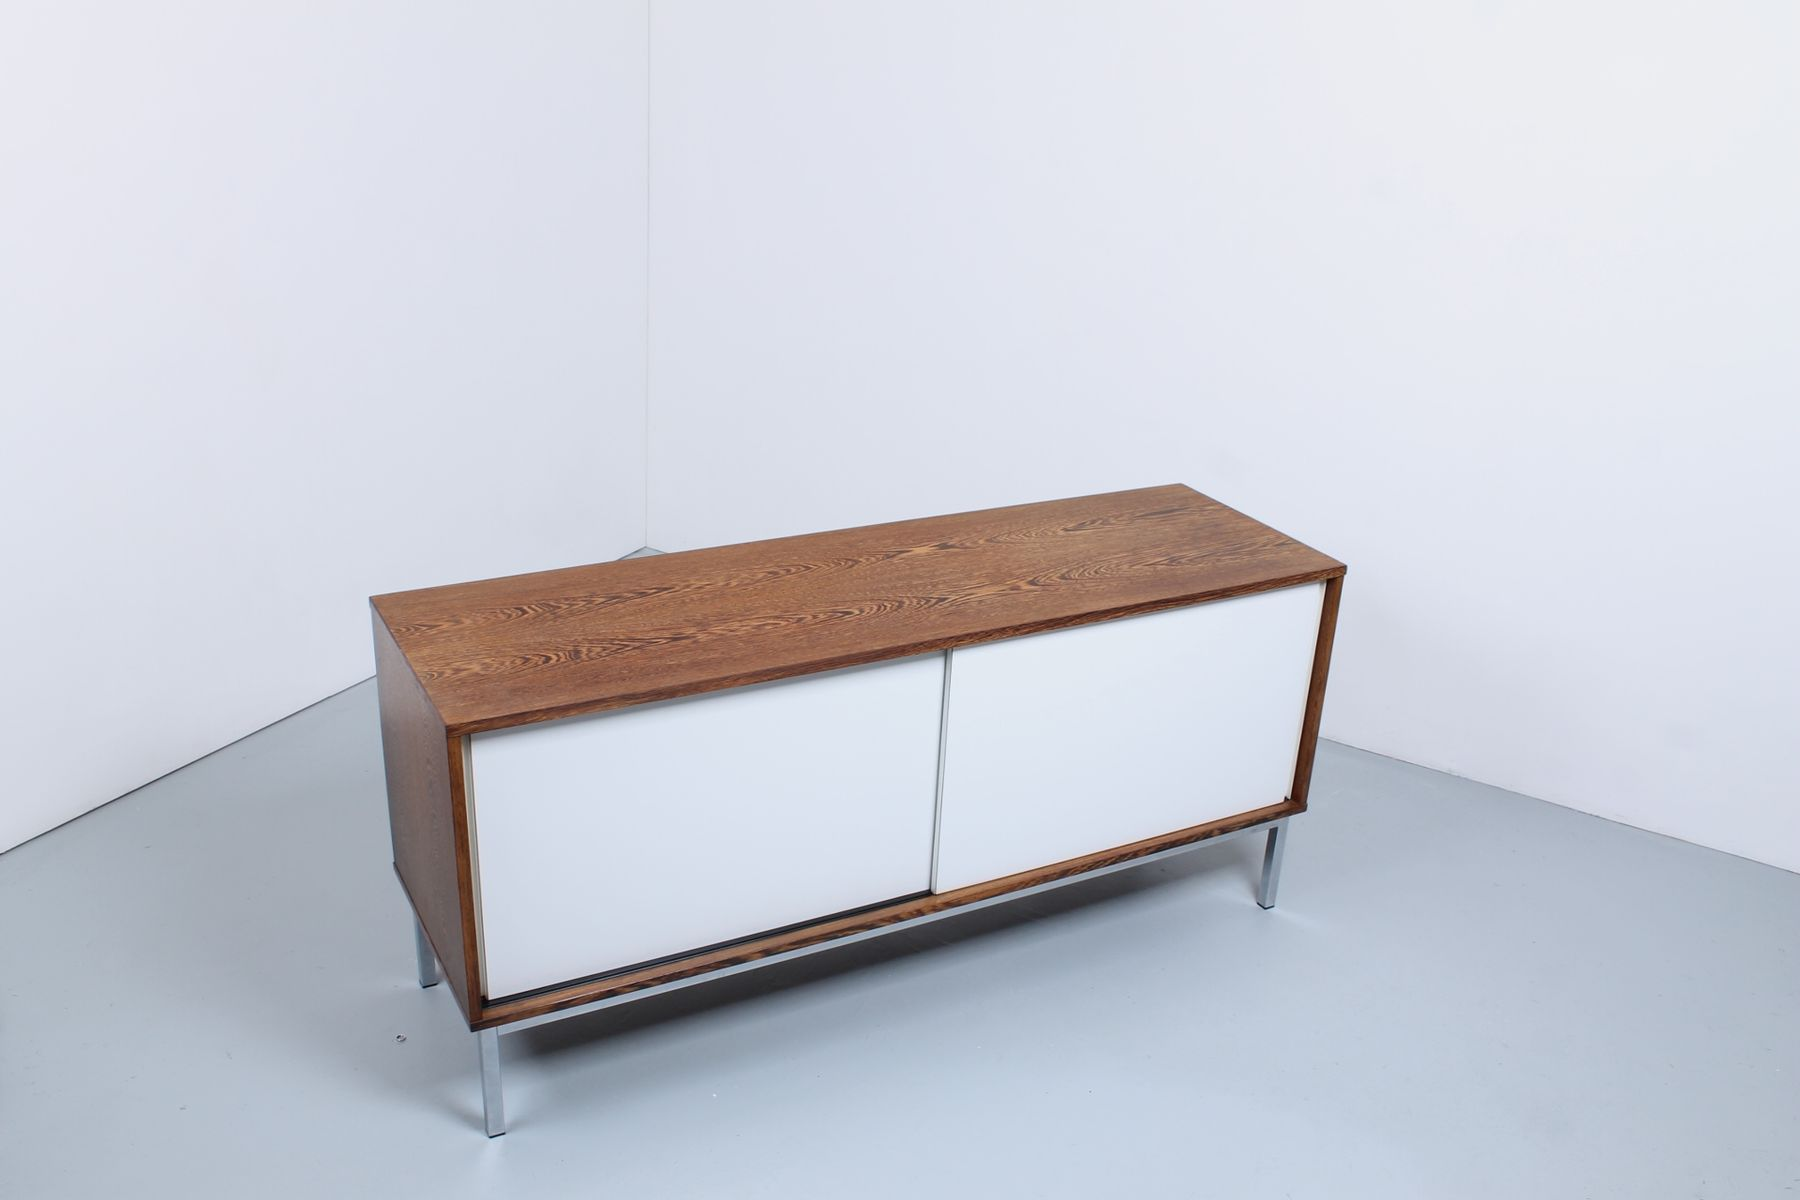 Vintage kw 87 sideboard in wenge veneer and white formica for Kommode wenge